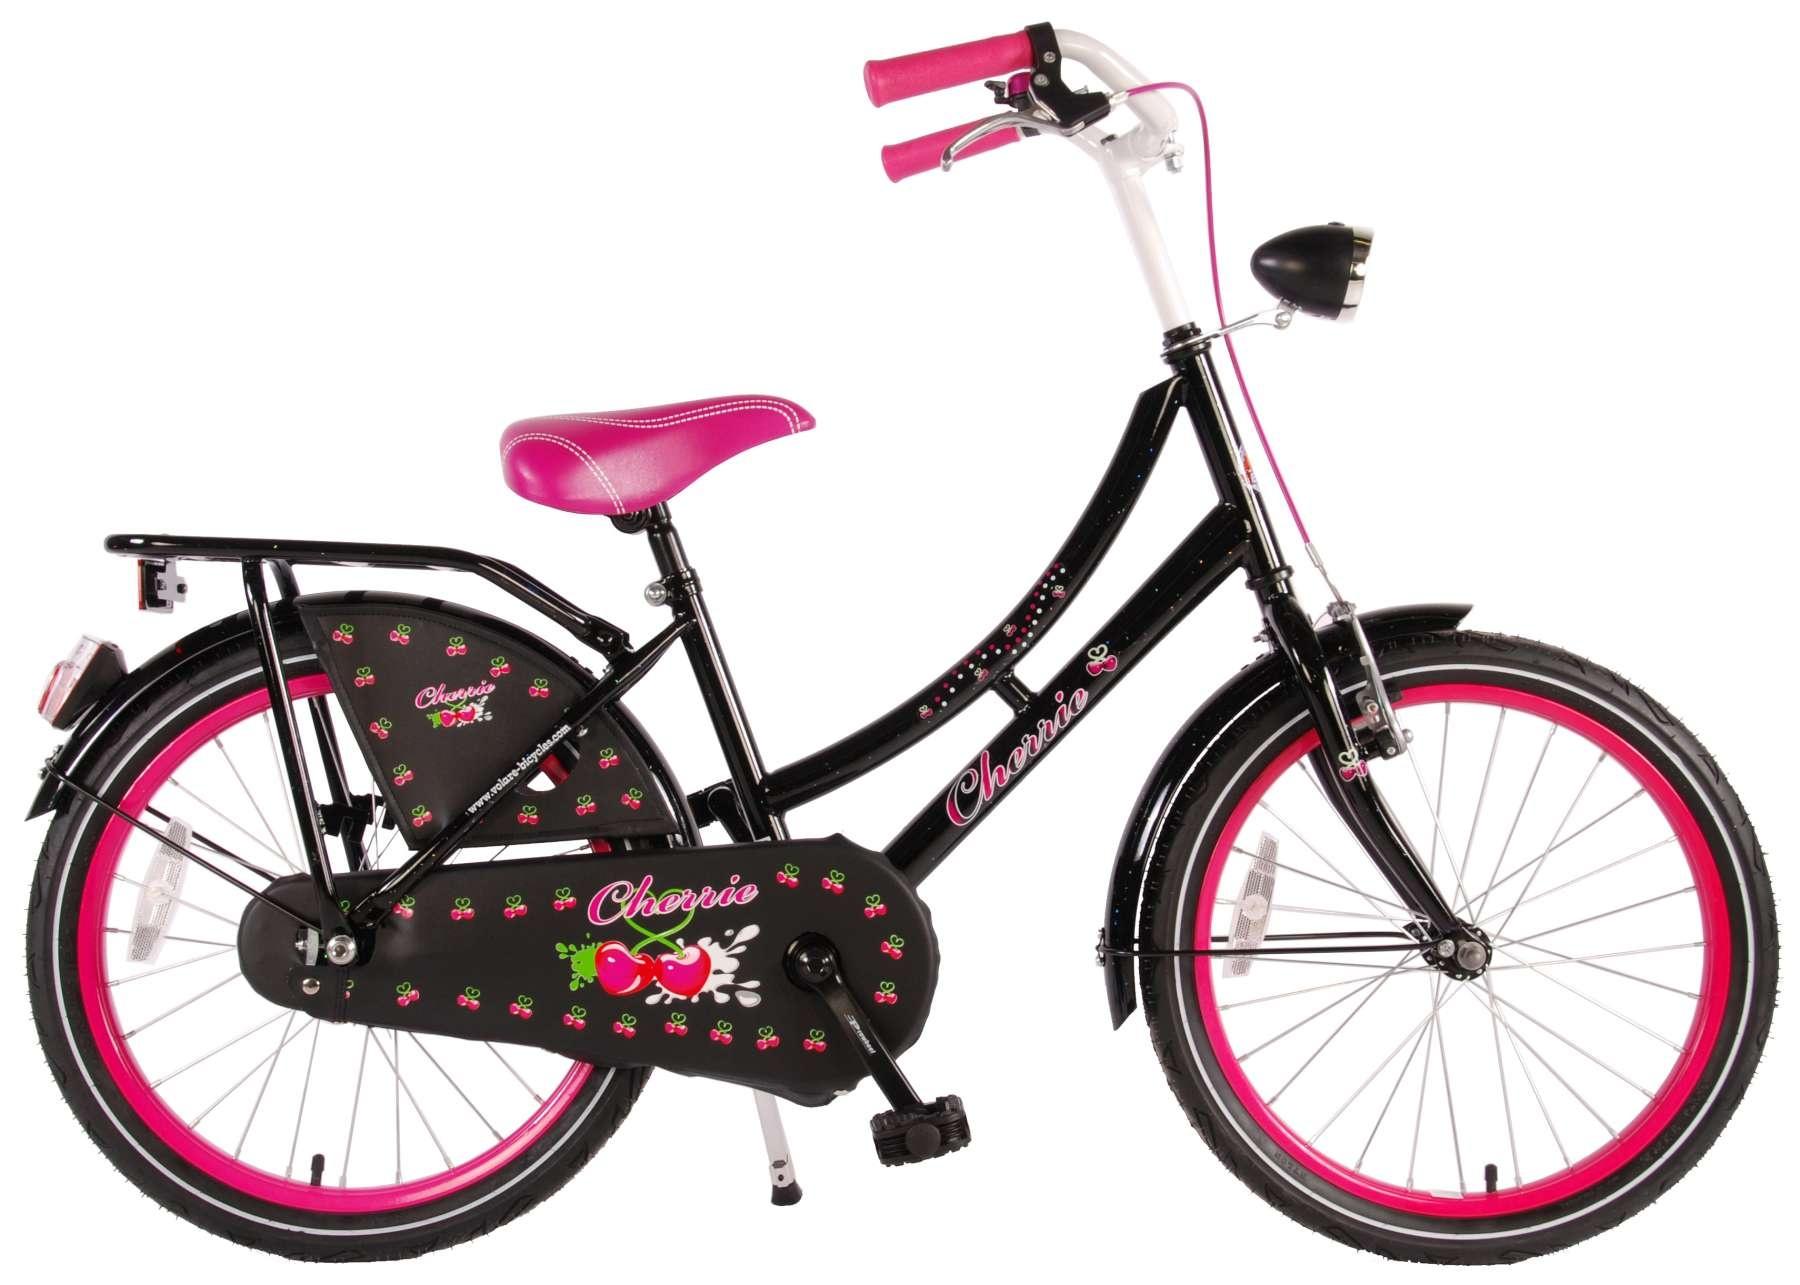 Volare Cherry Oma 20 Inch Girls Coaster Brake Black - Internet-Bikes